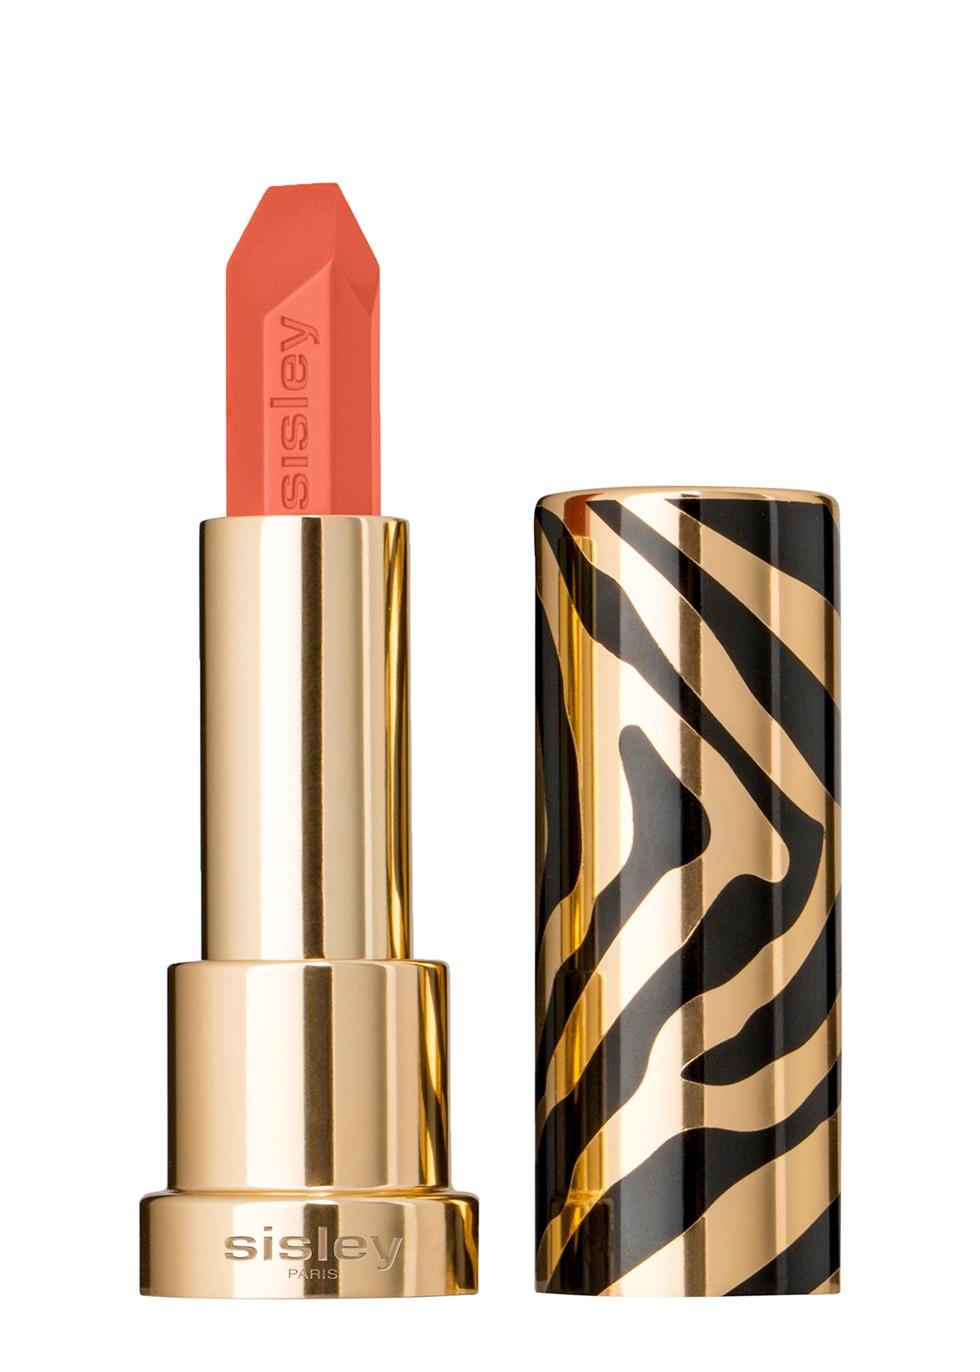 Le Phyto Rouge Lipstick - Sisley